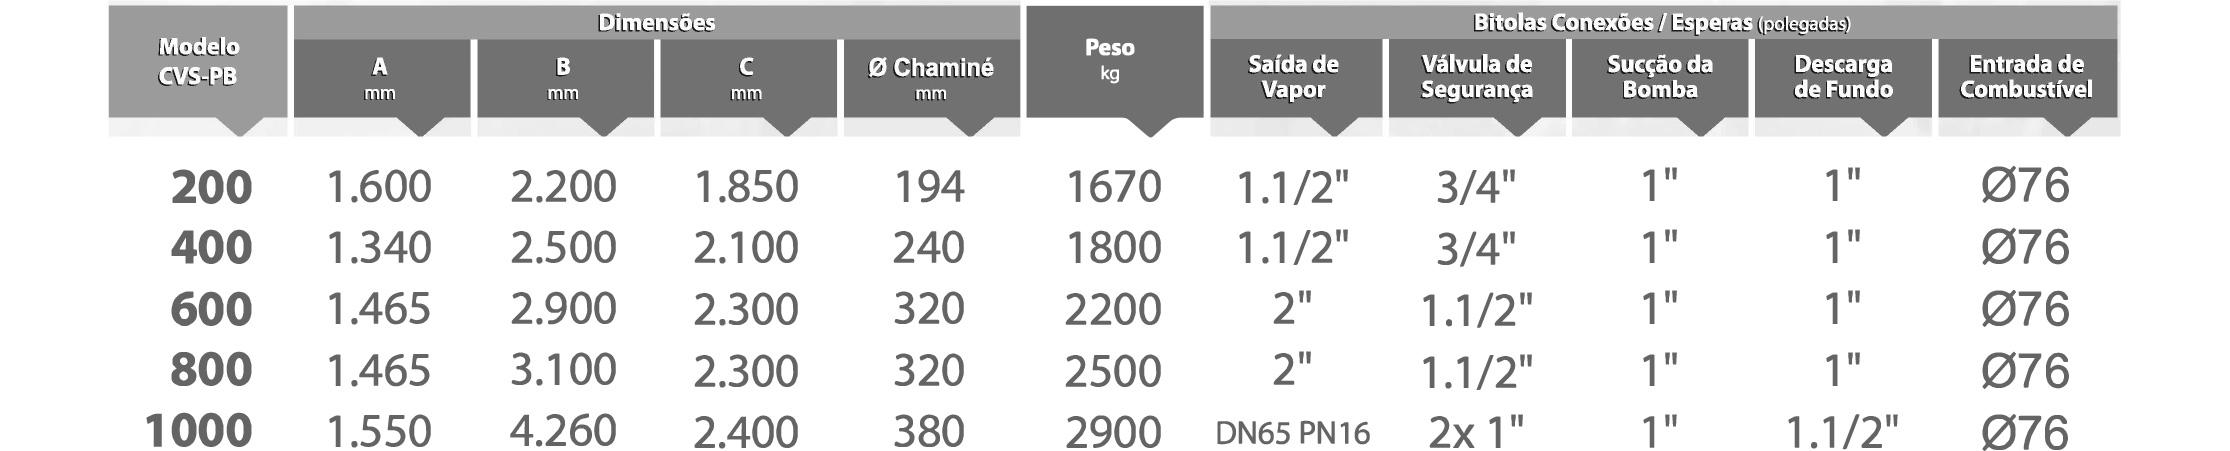 Dados Técnicos CVS-PB Icaterm